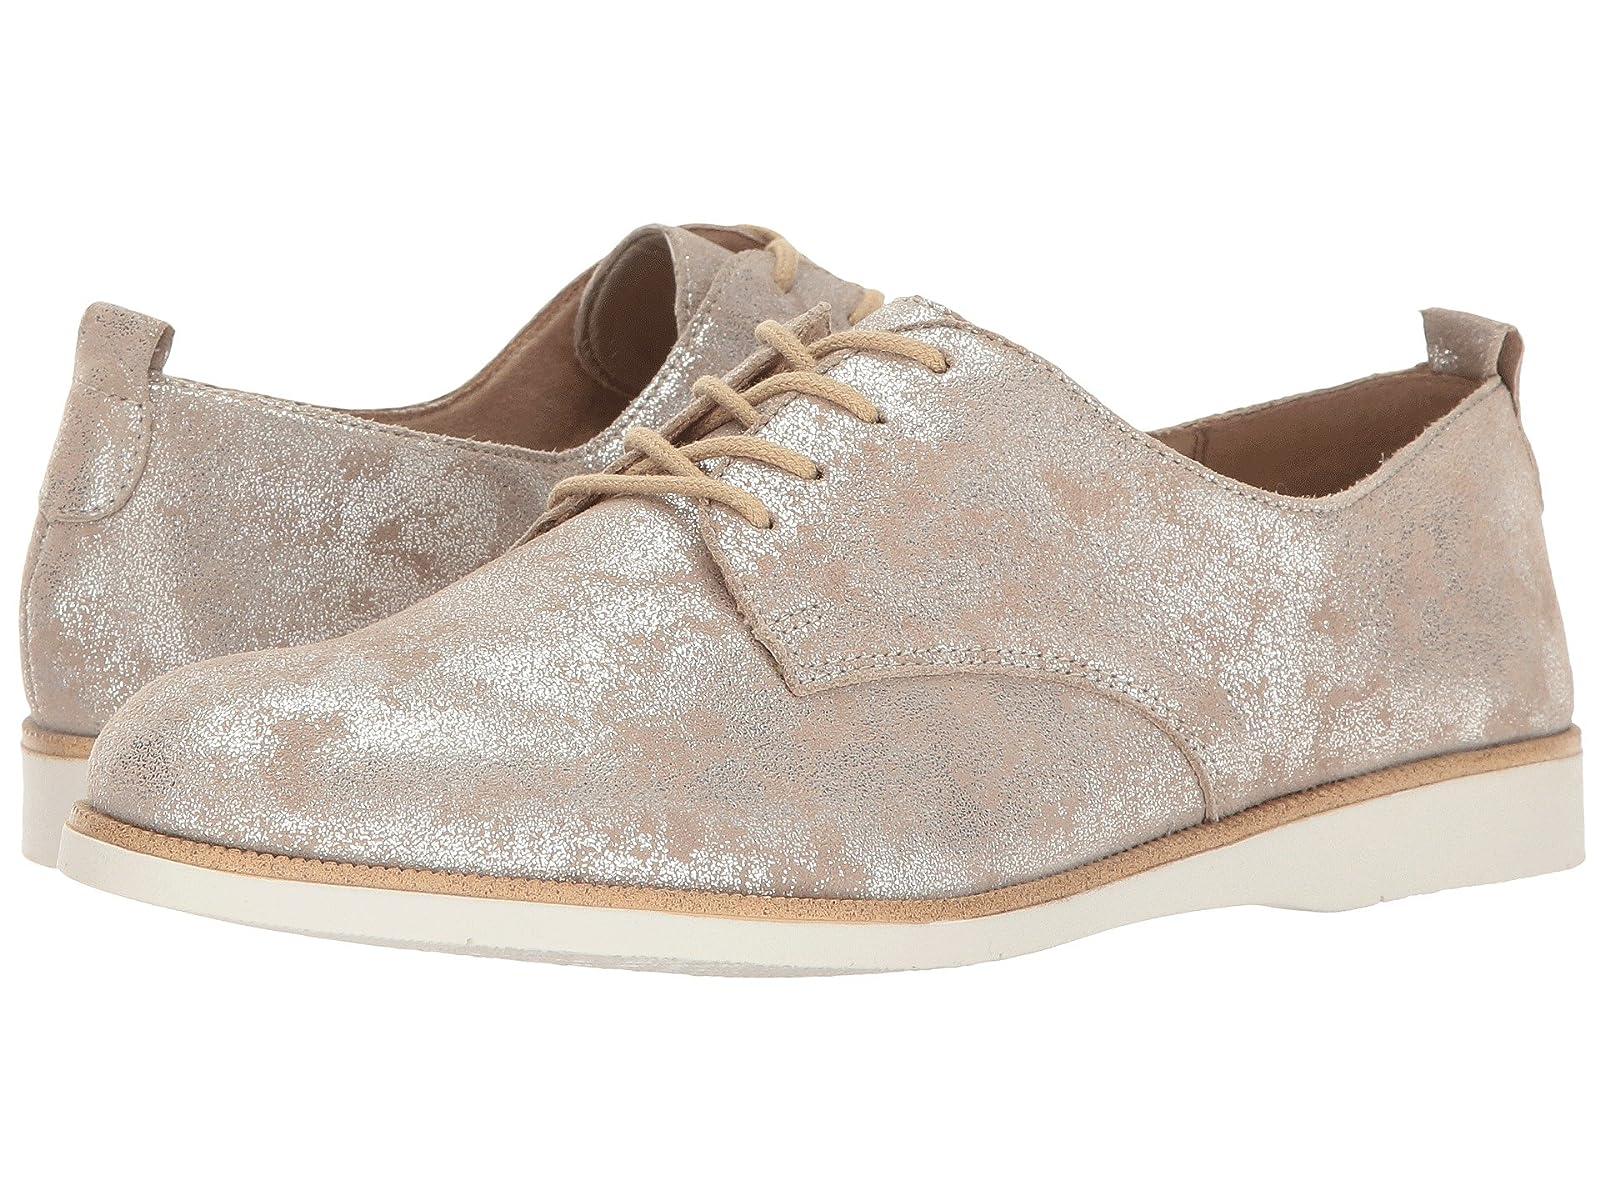 Rieker R0400 Kennya 00Cheap and distinctive eye-catching shoes